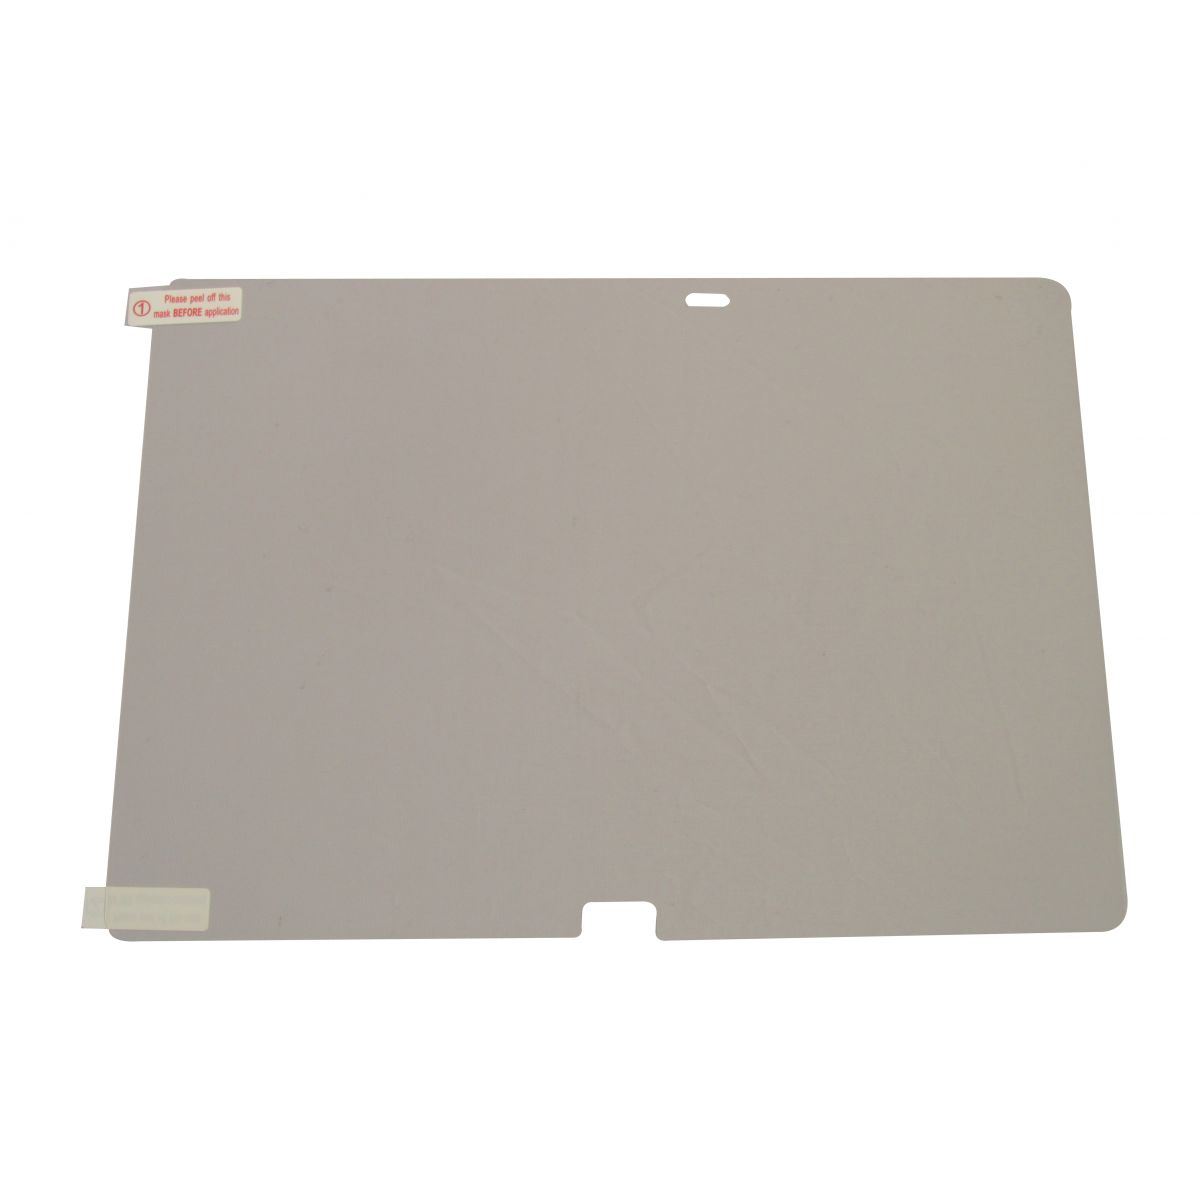 Película Protetora para Samsung Galaxy Tab S 10.5 T800 T805 - Fosca